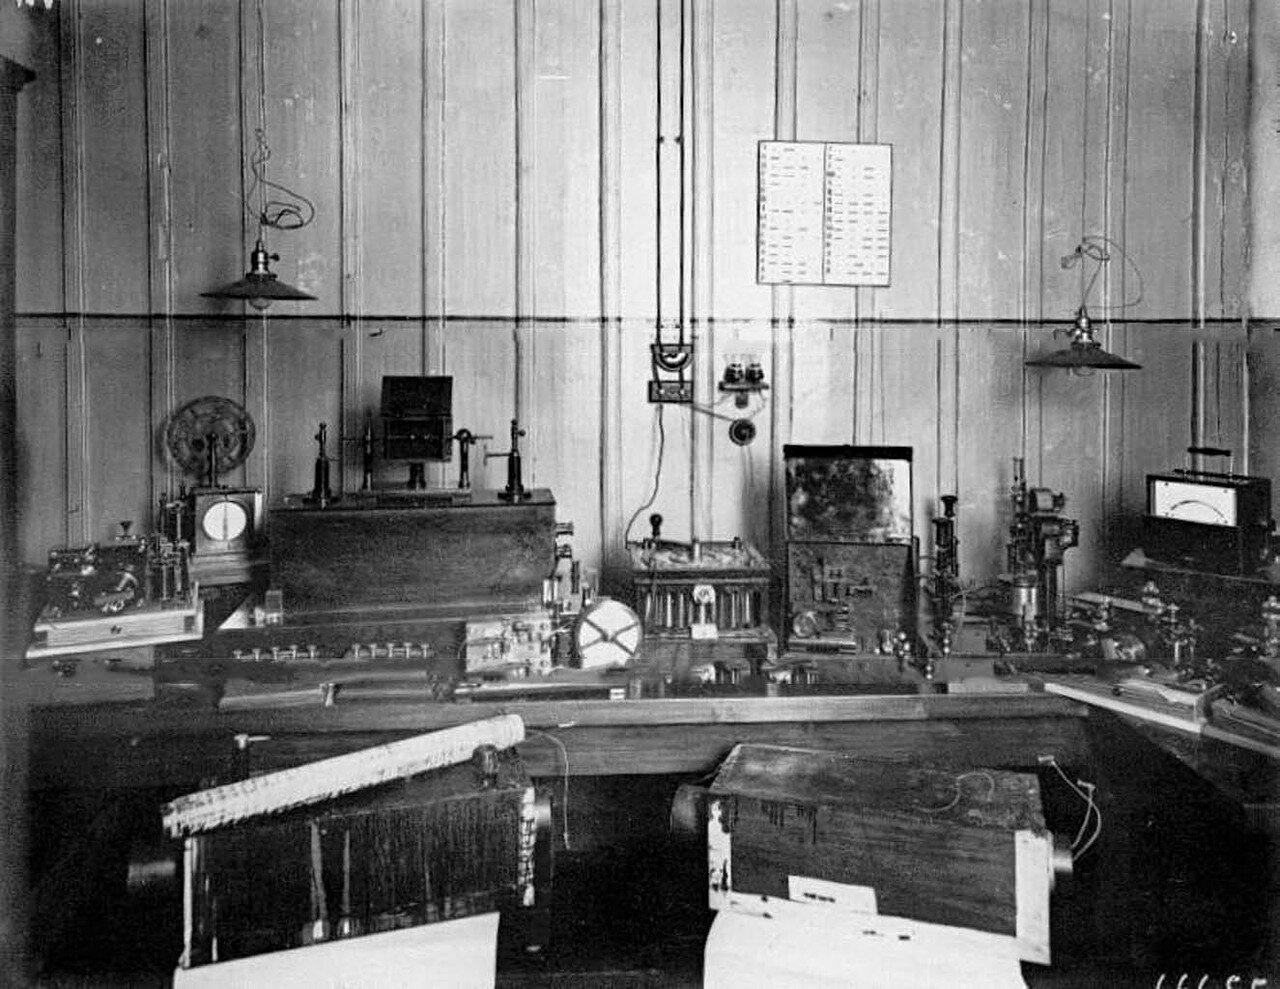 Кронштадтский электро-технический завод (г.Кронштадт). 05. Радиоаппаратура, изготовленная на заводе